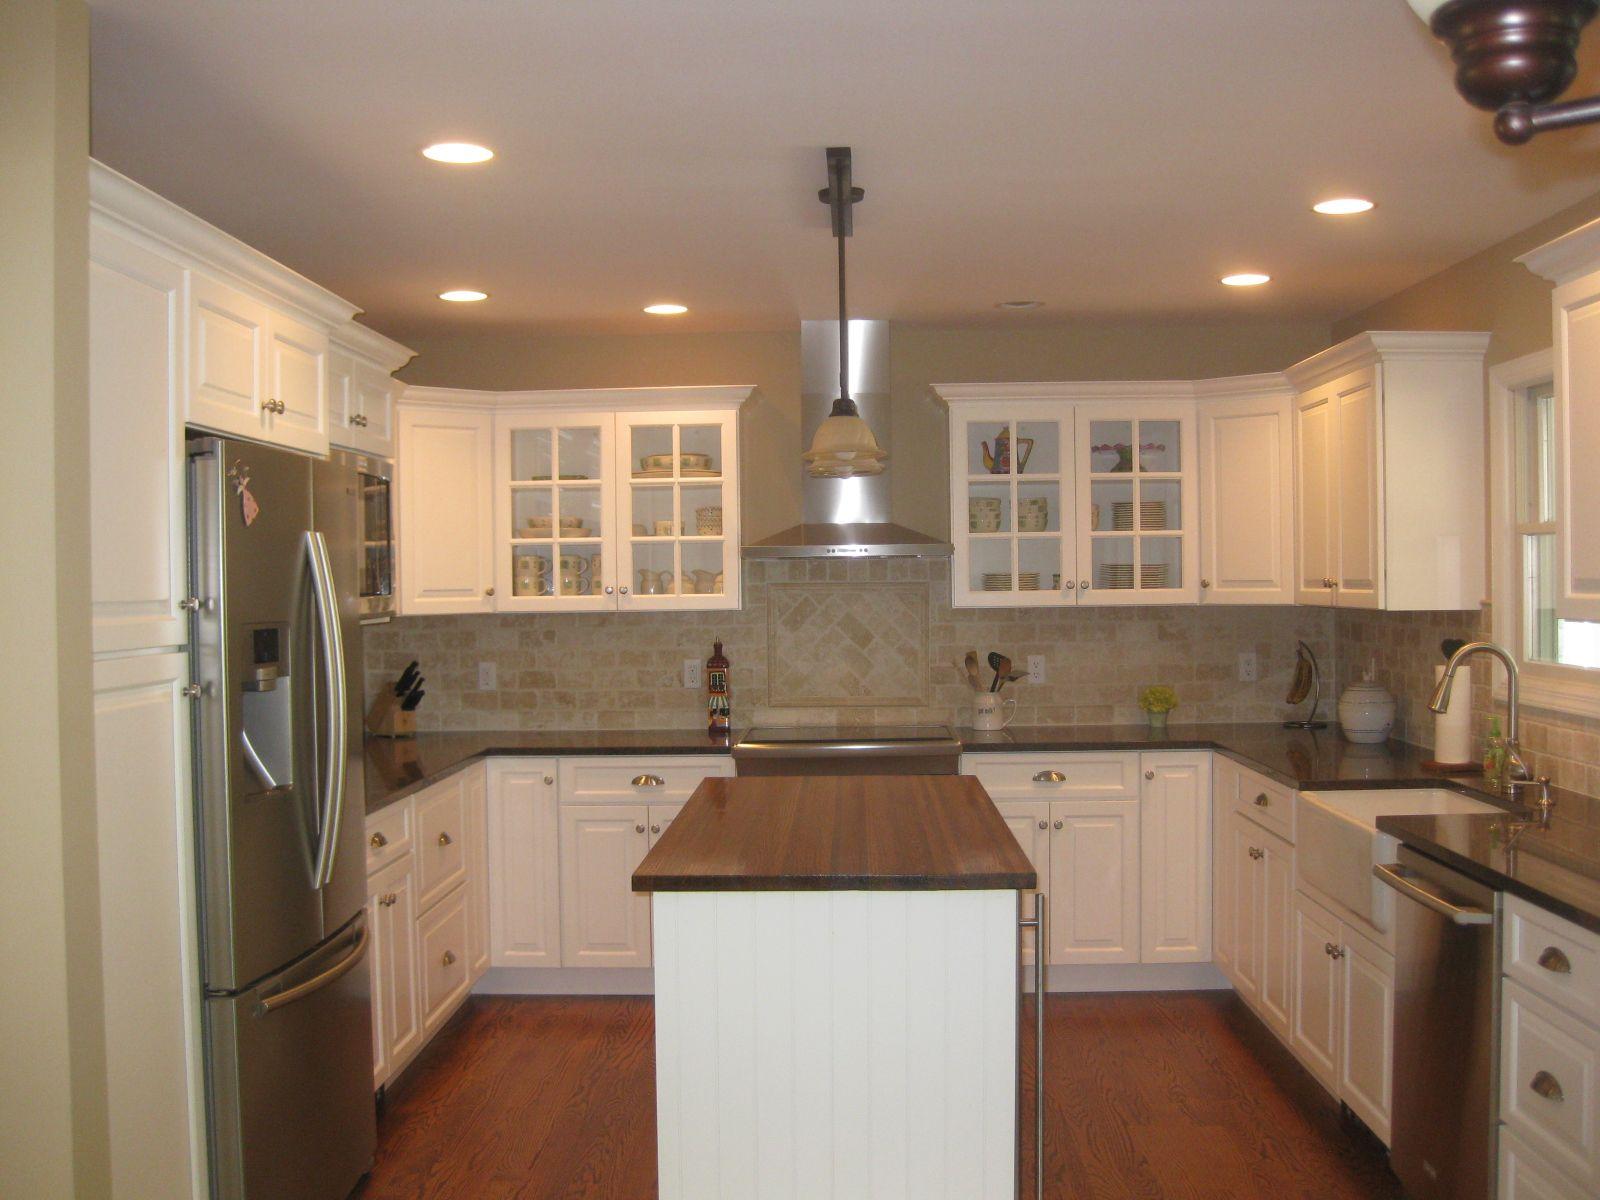 u shaped kitchen kitchen pinterest shapes kitchens and kitchen sets on kitchen ideas u shaped id=90507